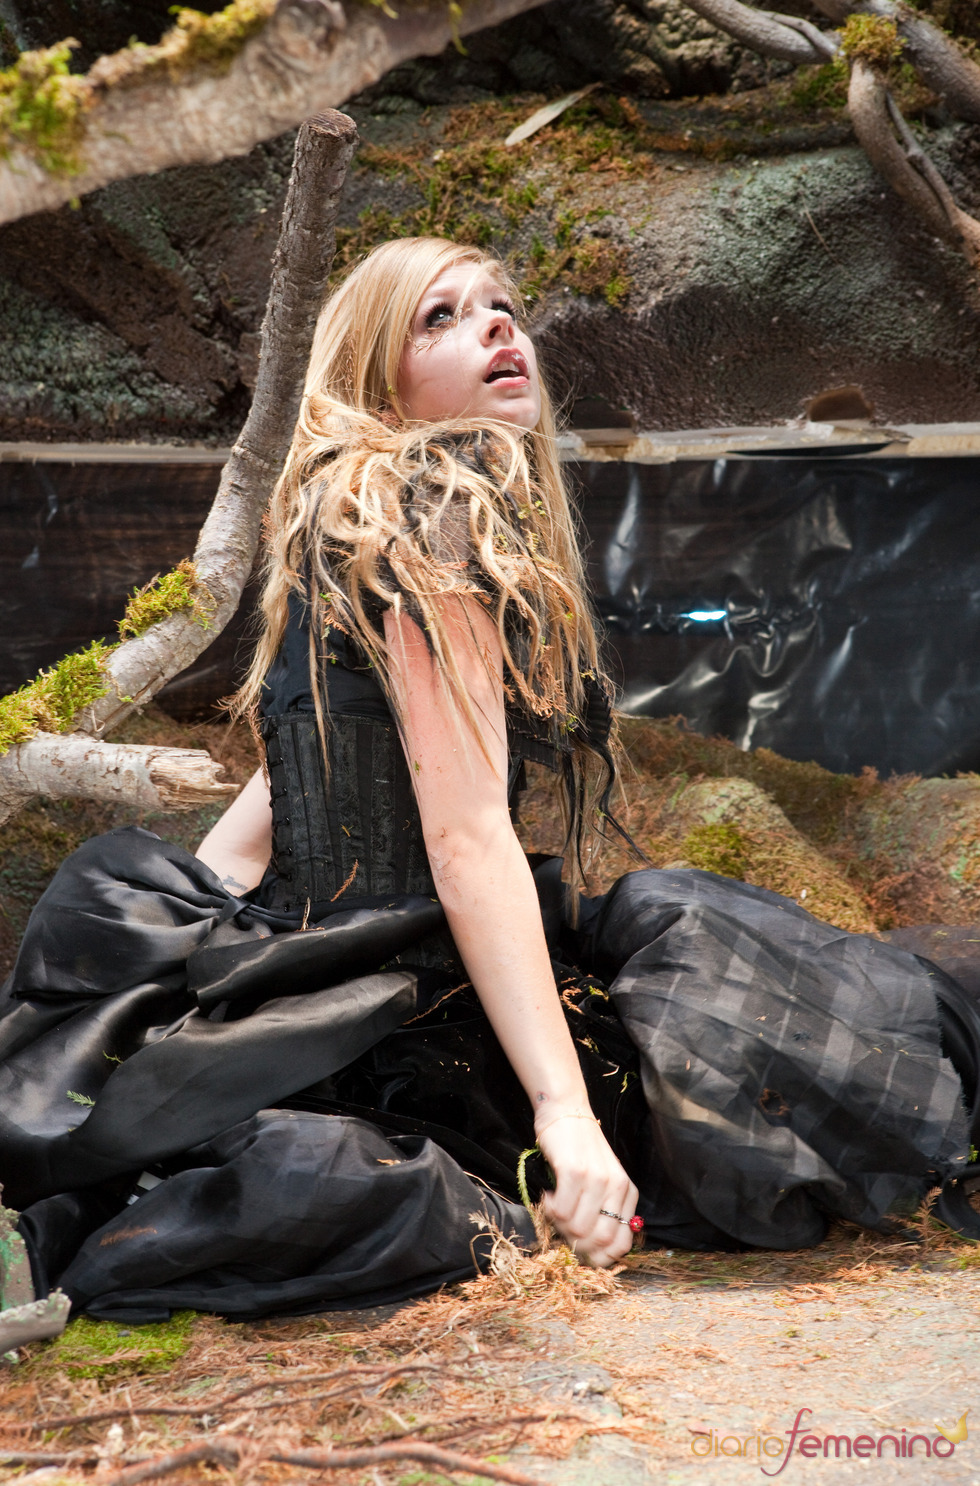 Videoclip de Avril Lavigne: 'Alice (Underground)'